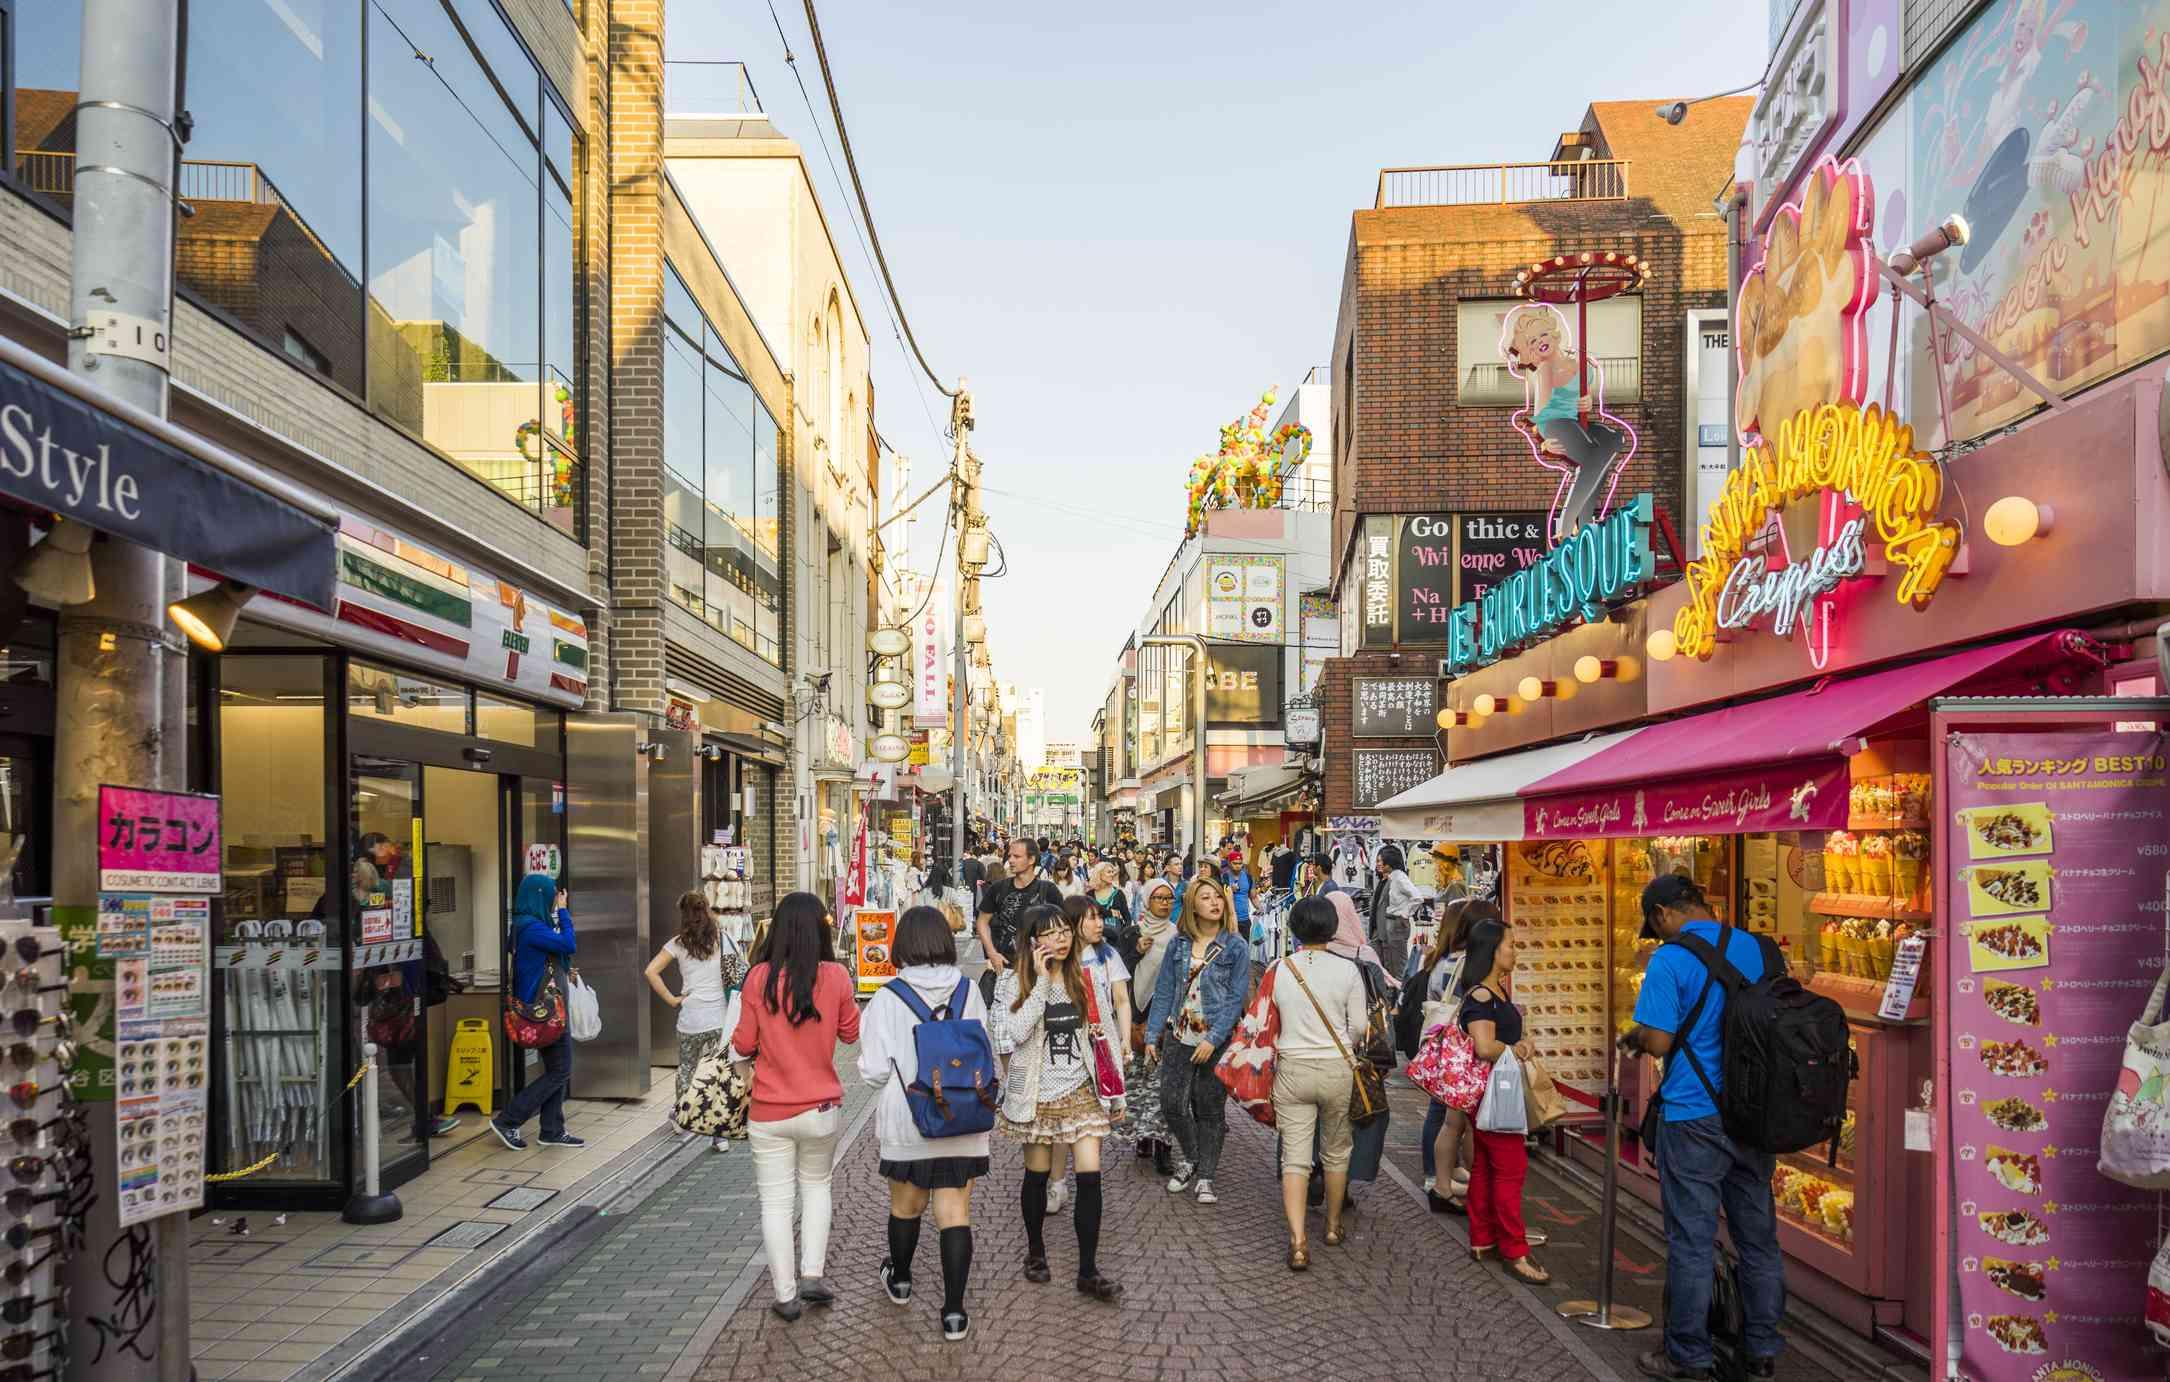 Crowded Takeshita shopping street in Harajuku fashion district